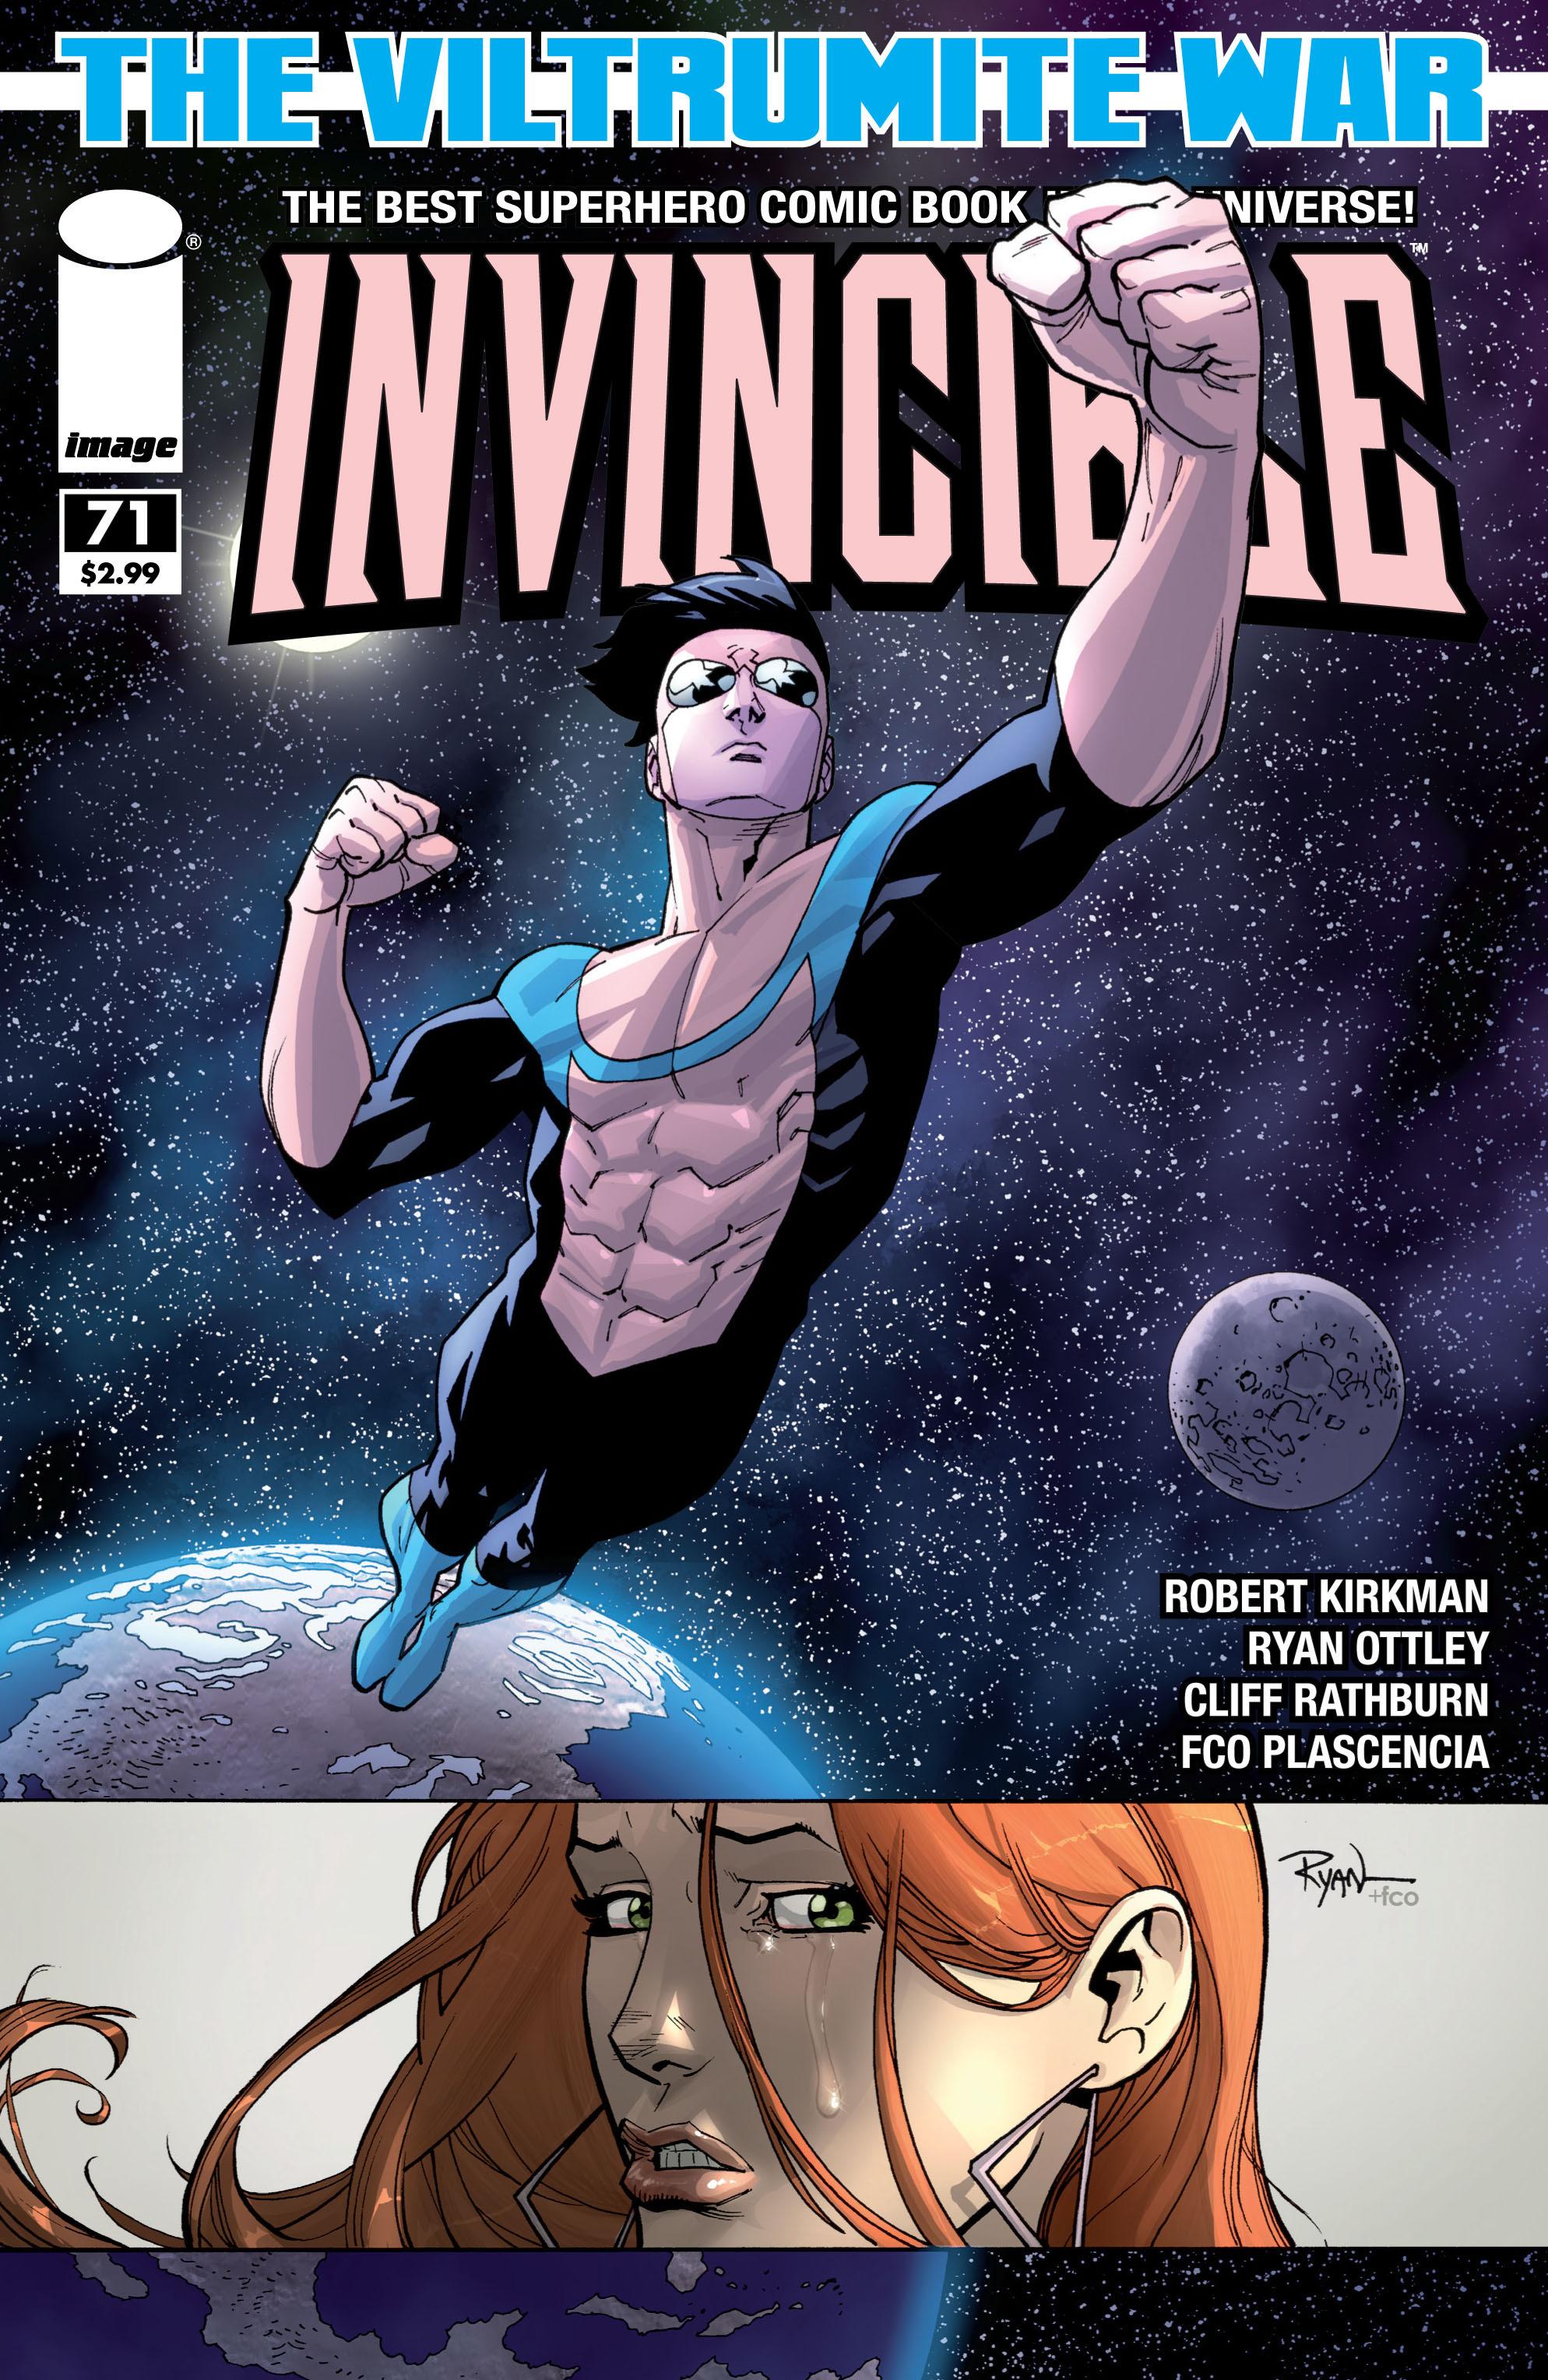 Invincible 71 Page 1